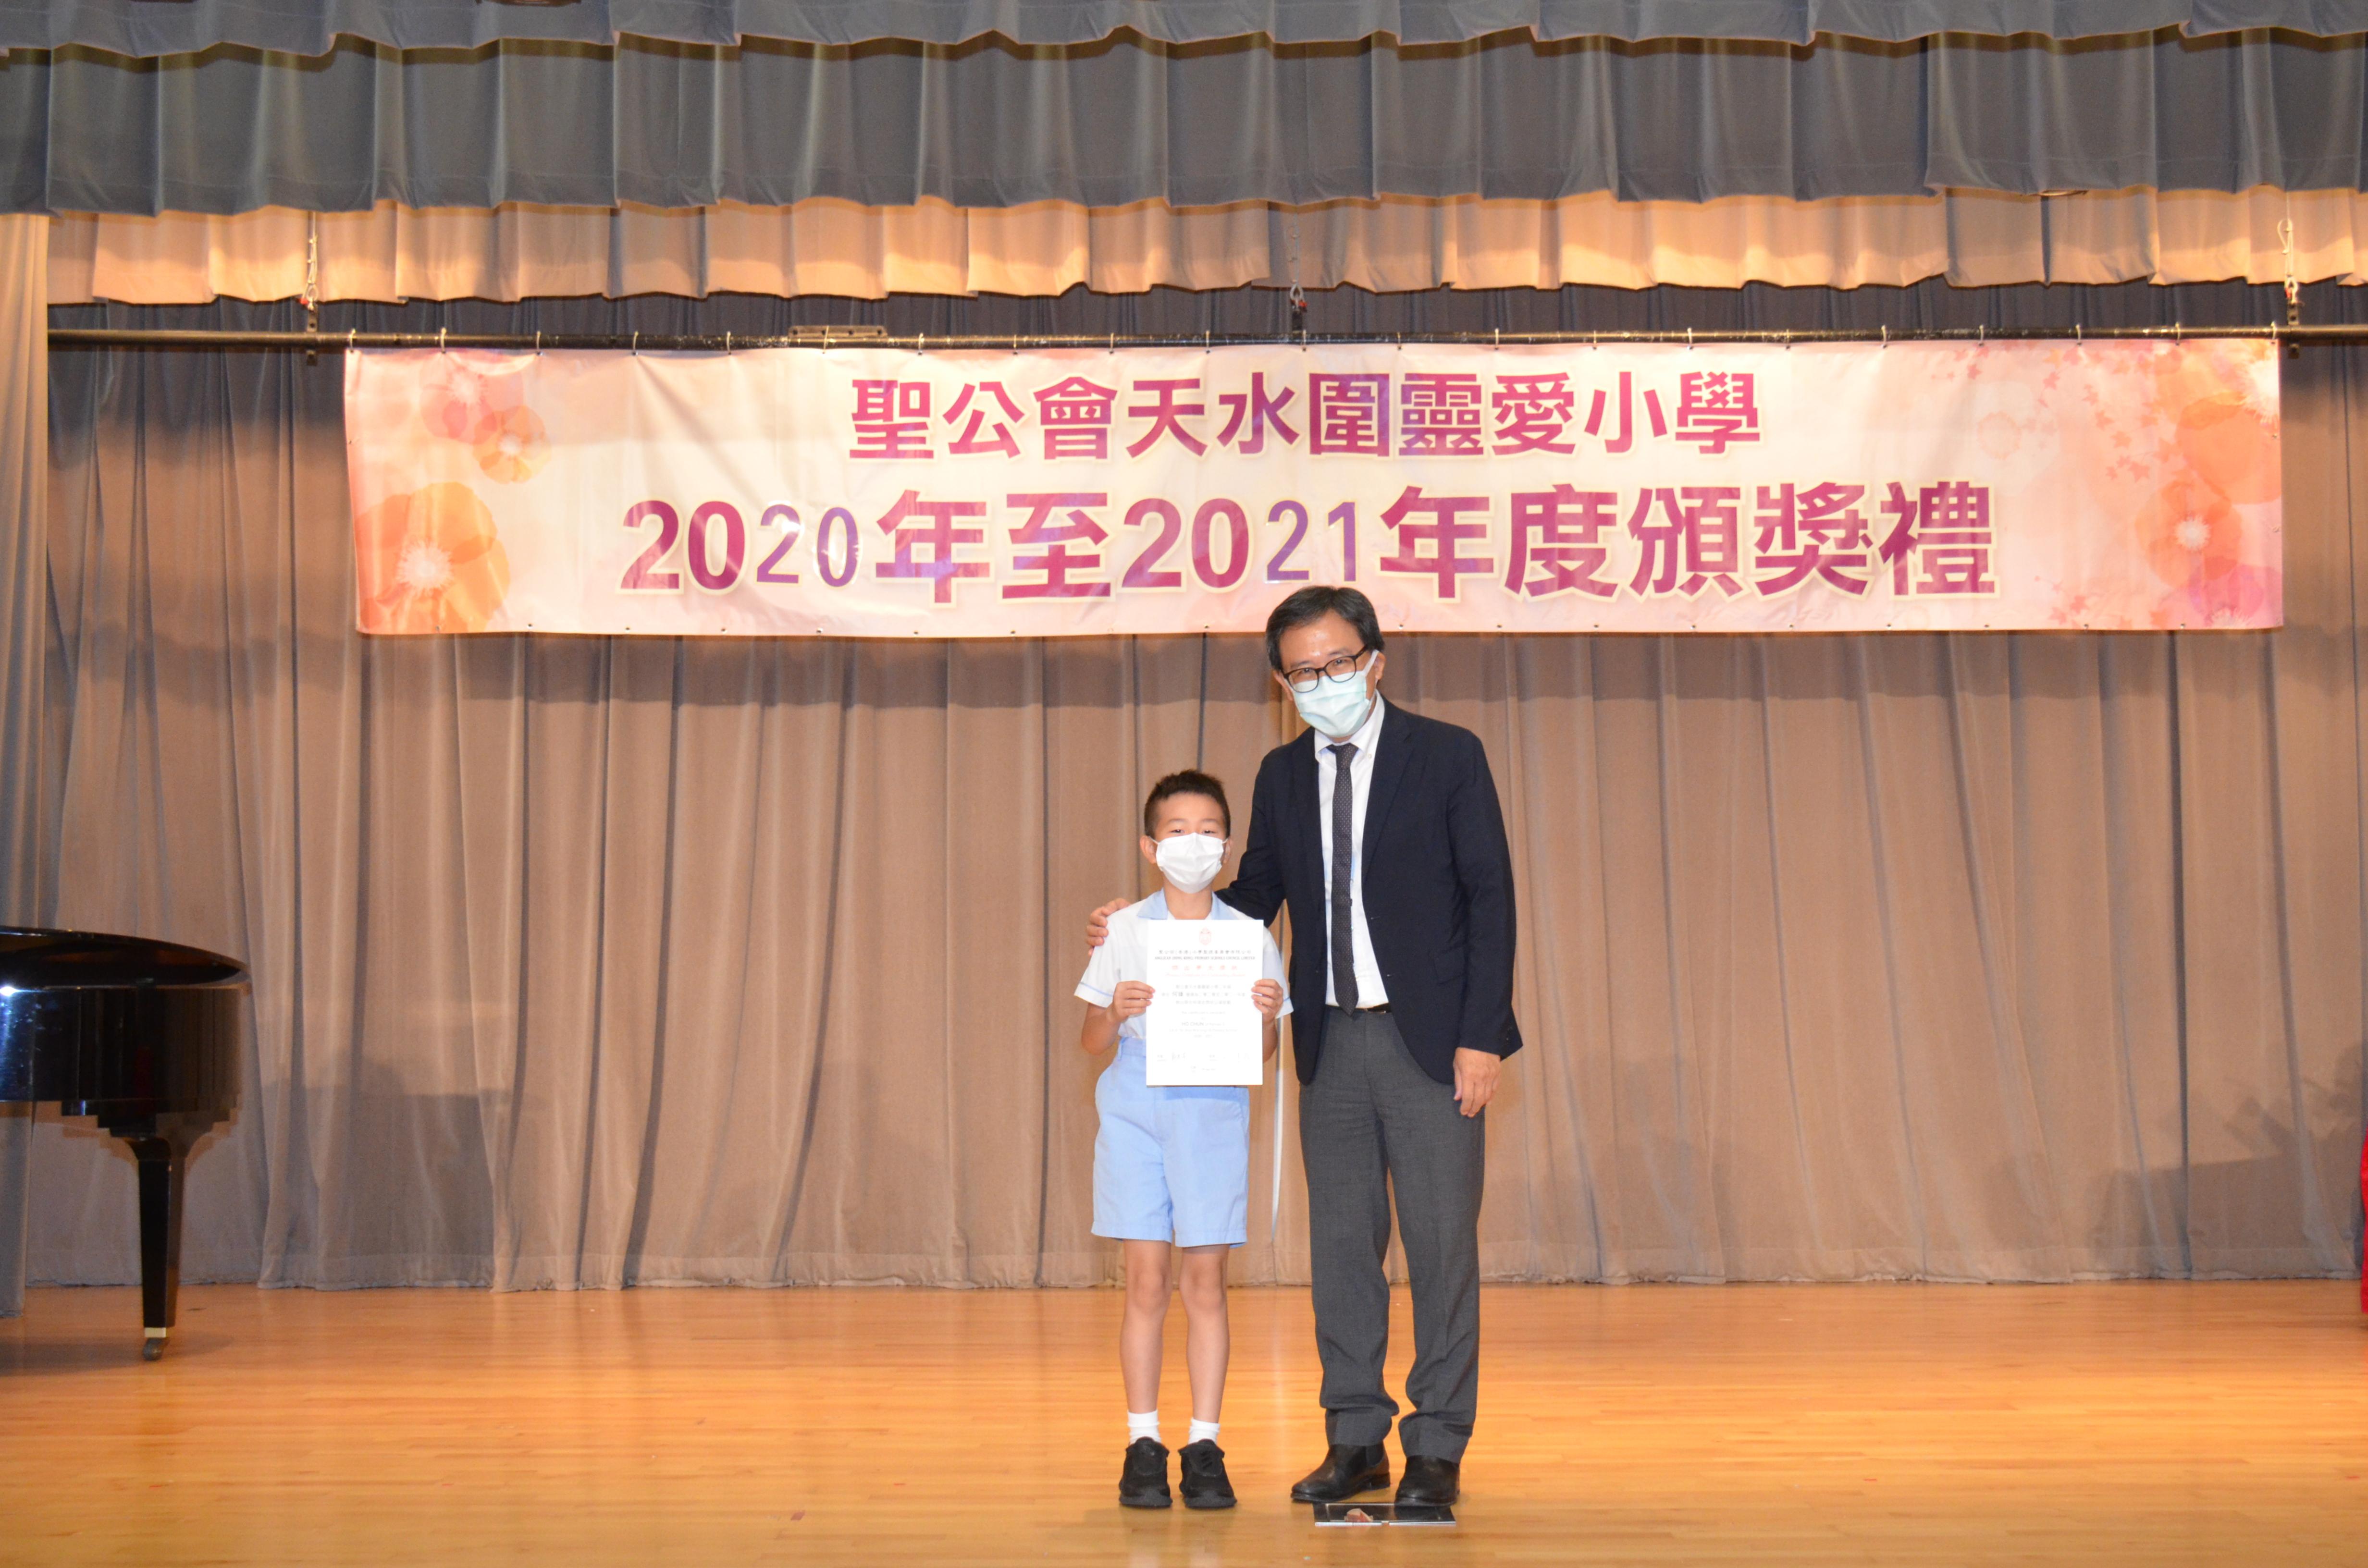 https://skhtswlo.edu.hk/sites/default/files/dsc_3471_1.jpg